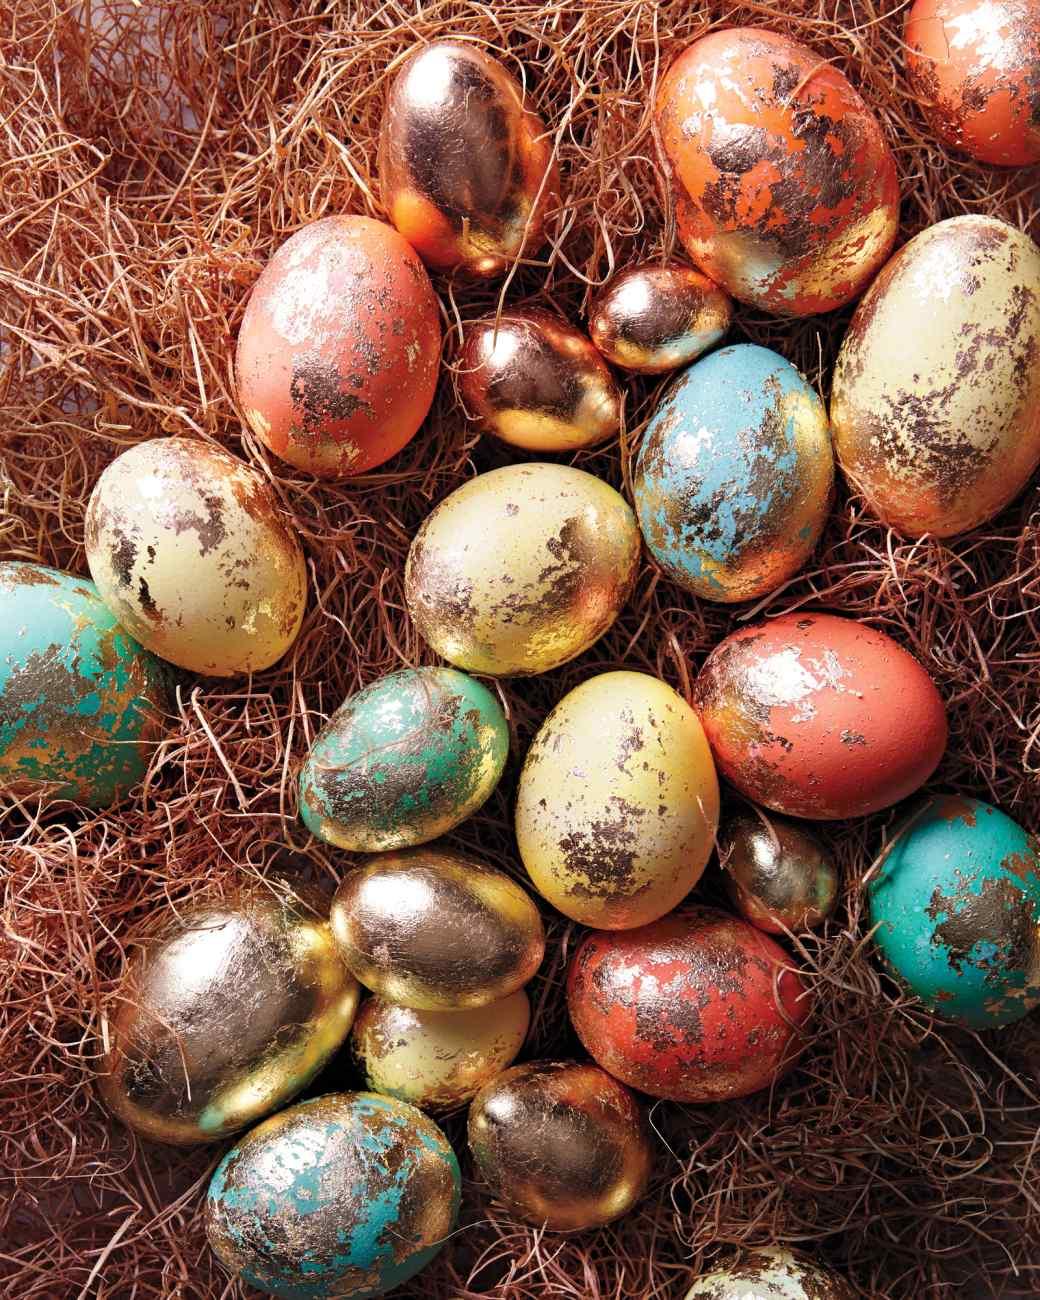 10 dreamy ideas to dye easter eggs daily dream decor